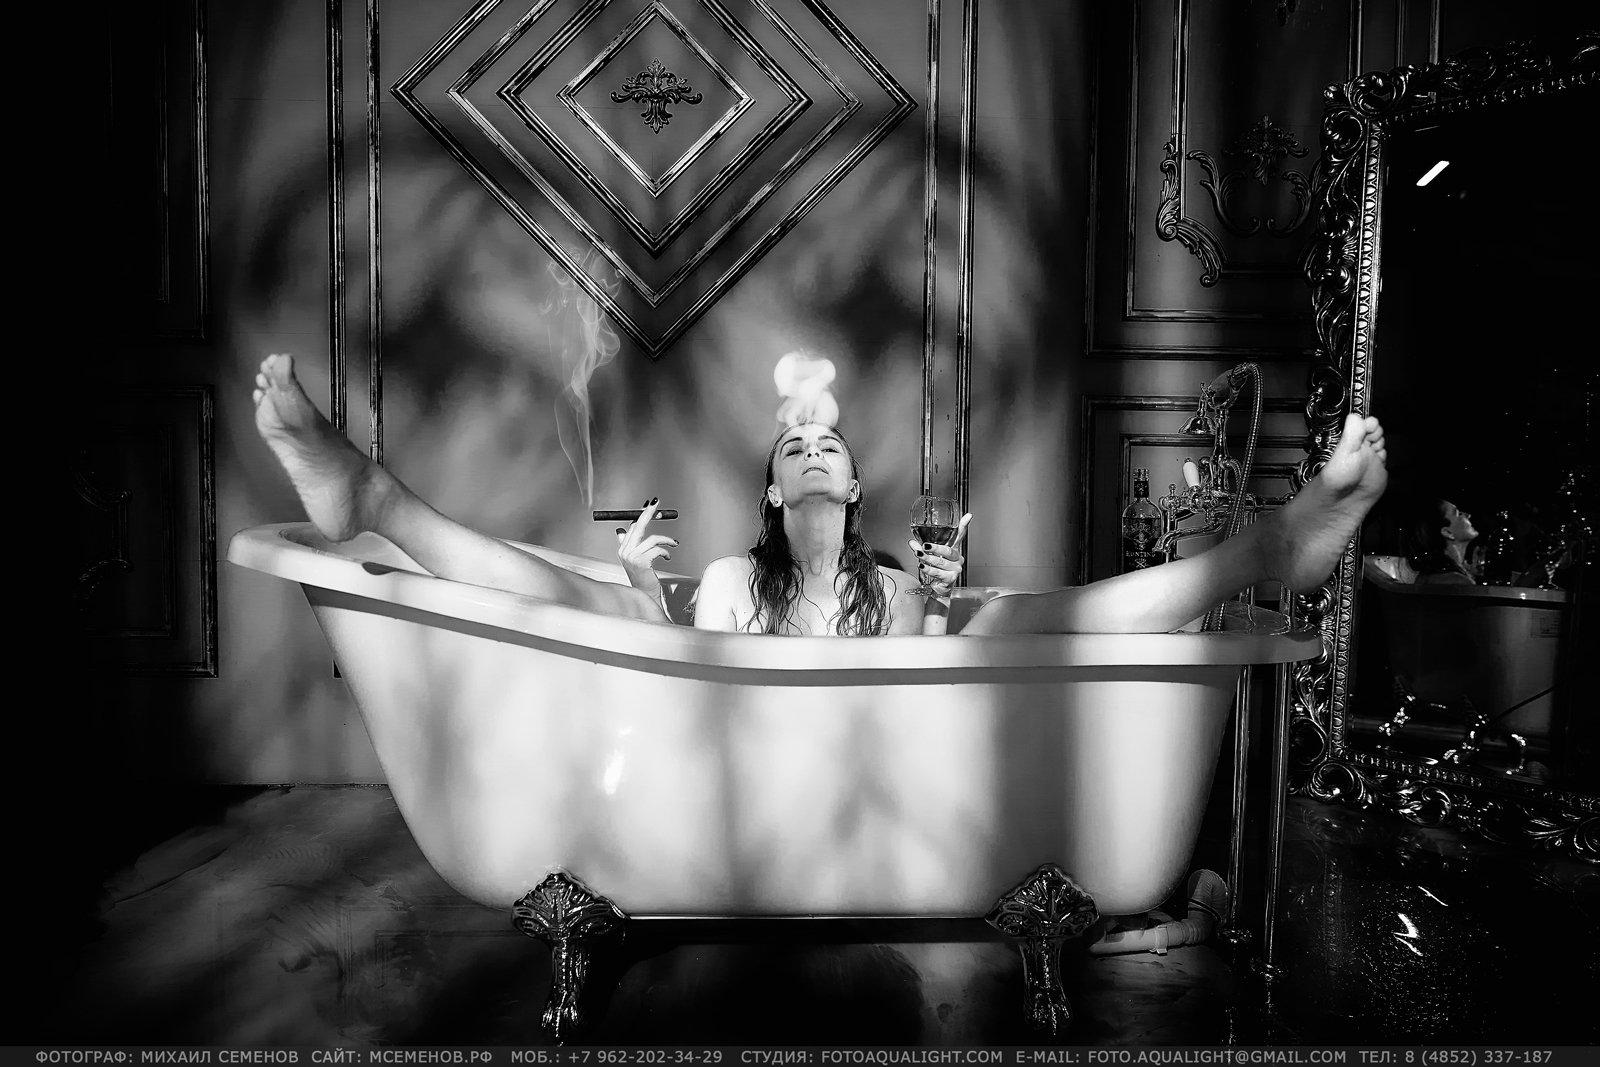 aqua, attractive, balance, bathing, beautiful, beauty, bliss, blue, body, care, clean, dayspa, energy, face, female, fresh, girl, happy, harmony, healing, health, healthcare, healthy, hygiene, lady, lingerie, living, lovely, makeup, pretty, pure, purity,, Михаил Семенов